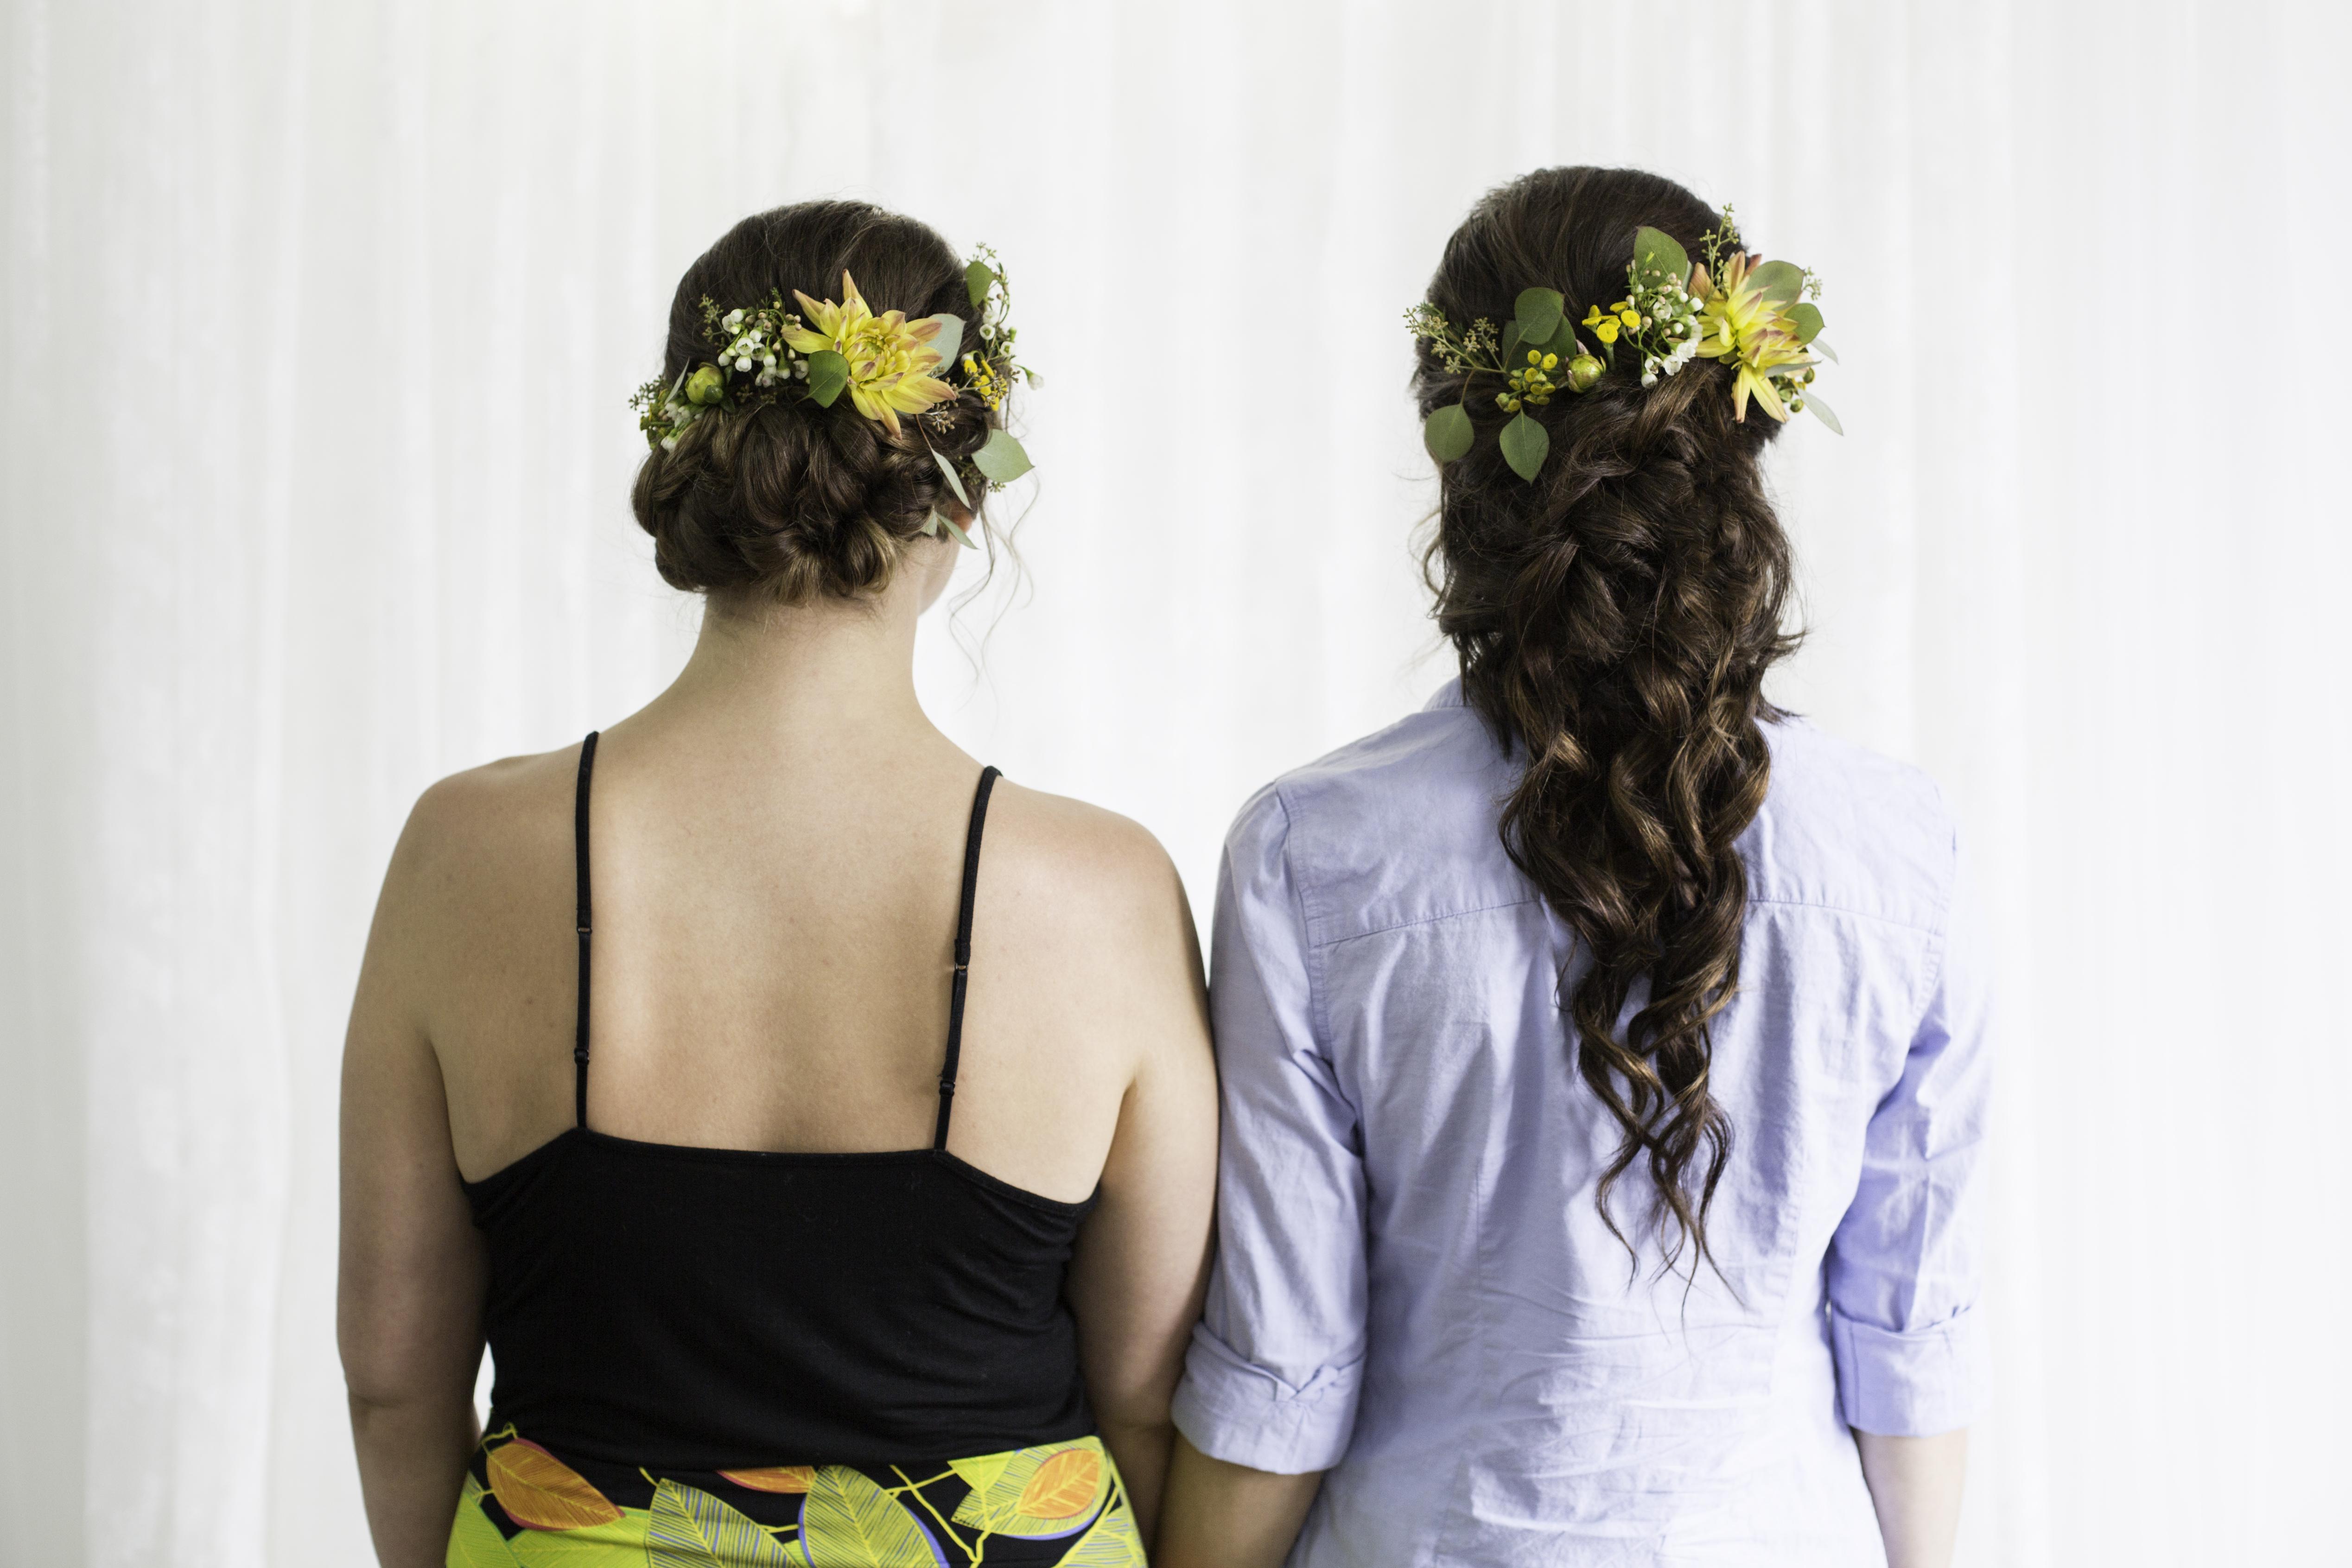 2 brides on their wedding day